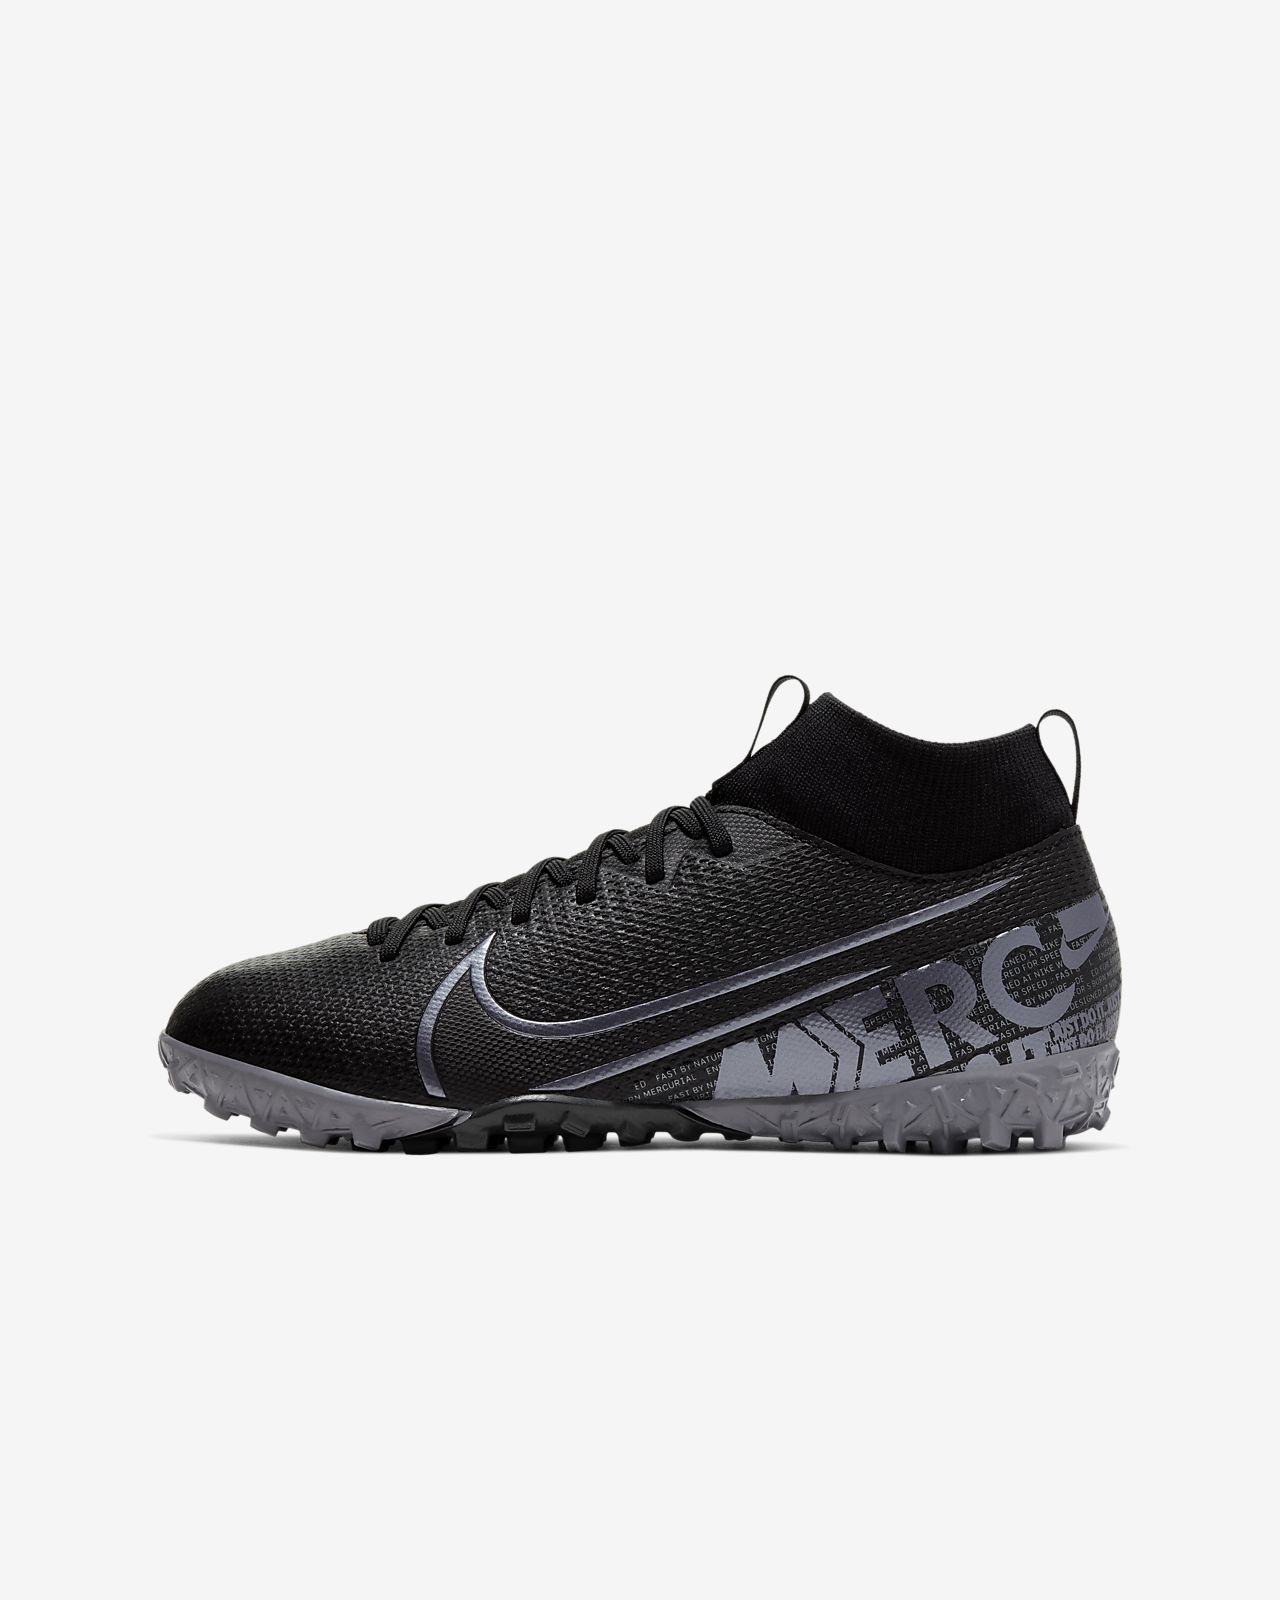 Nike Jr. Mercurial Superfly 7 Academy TF Voetbalschoen voor kleuters/